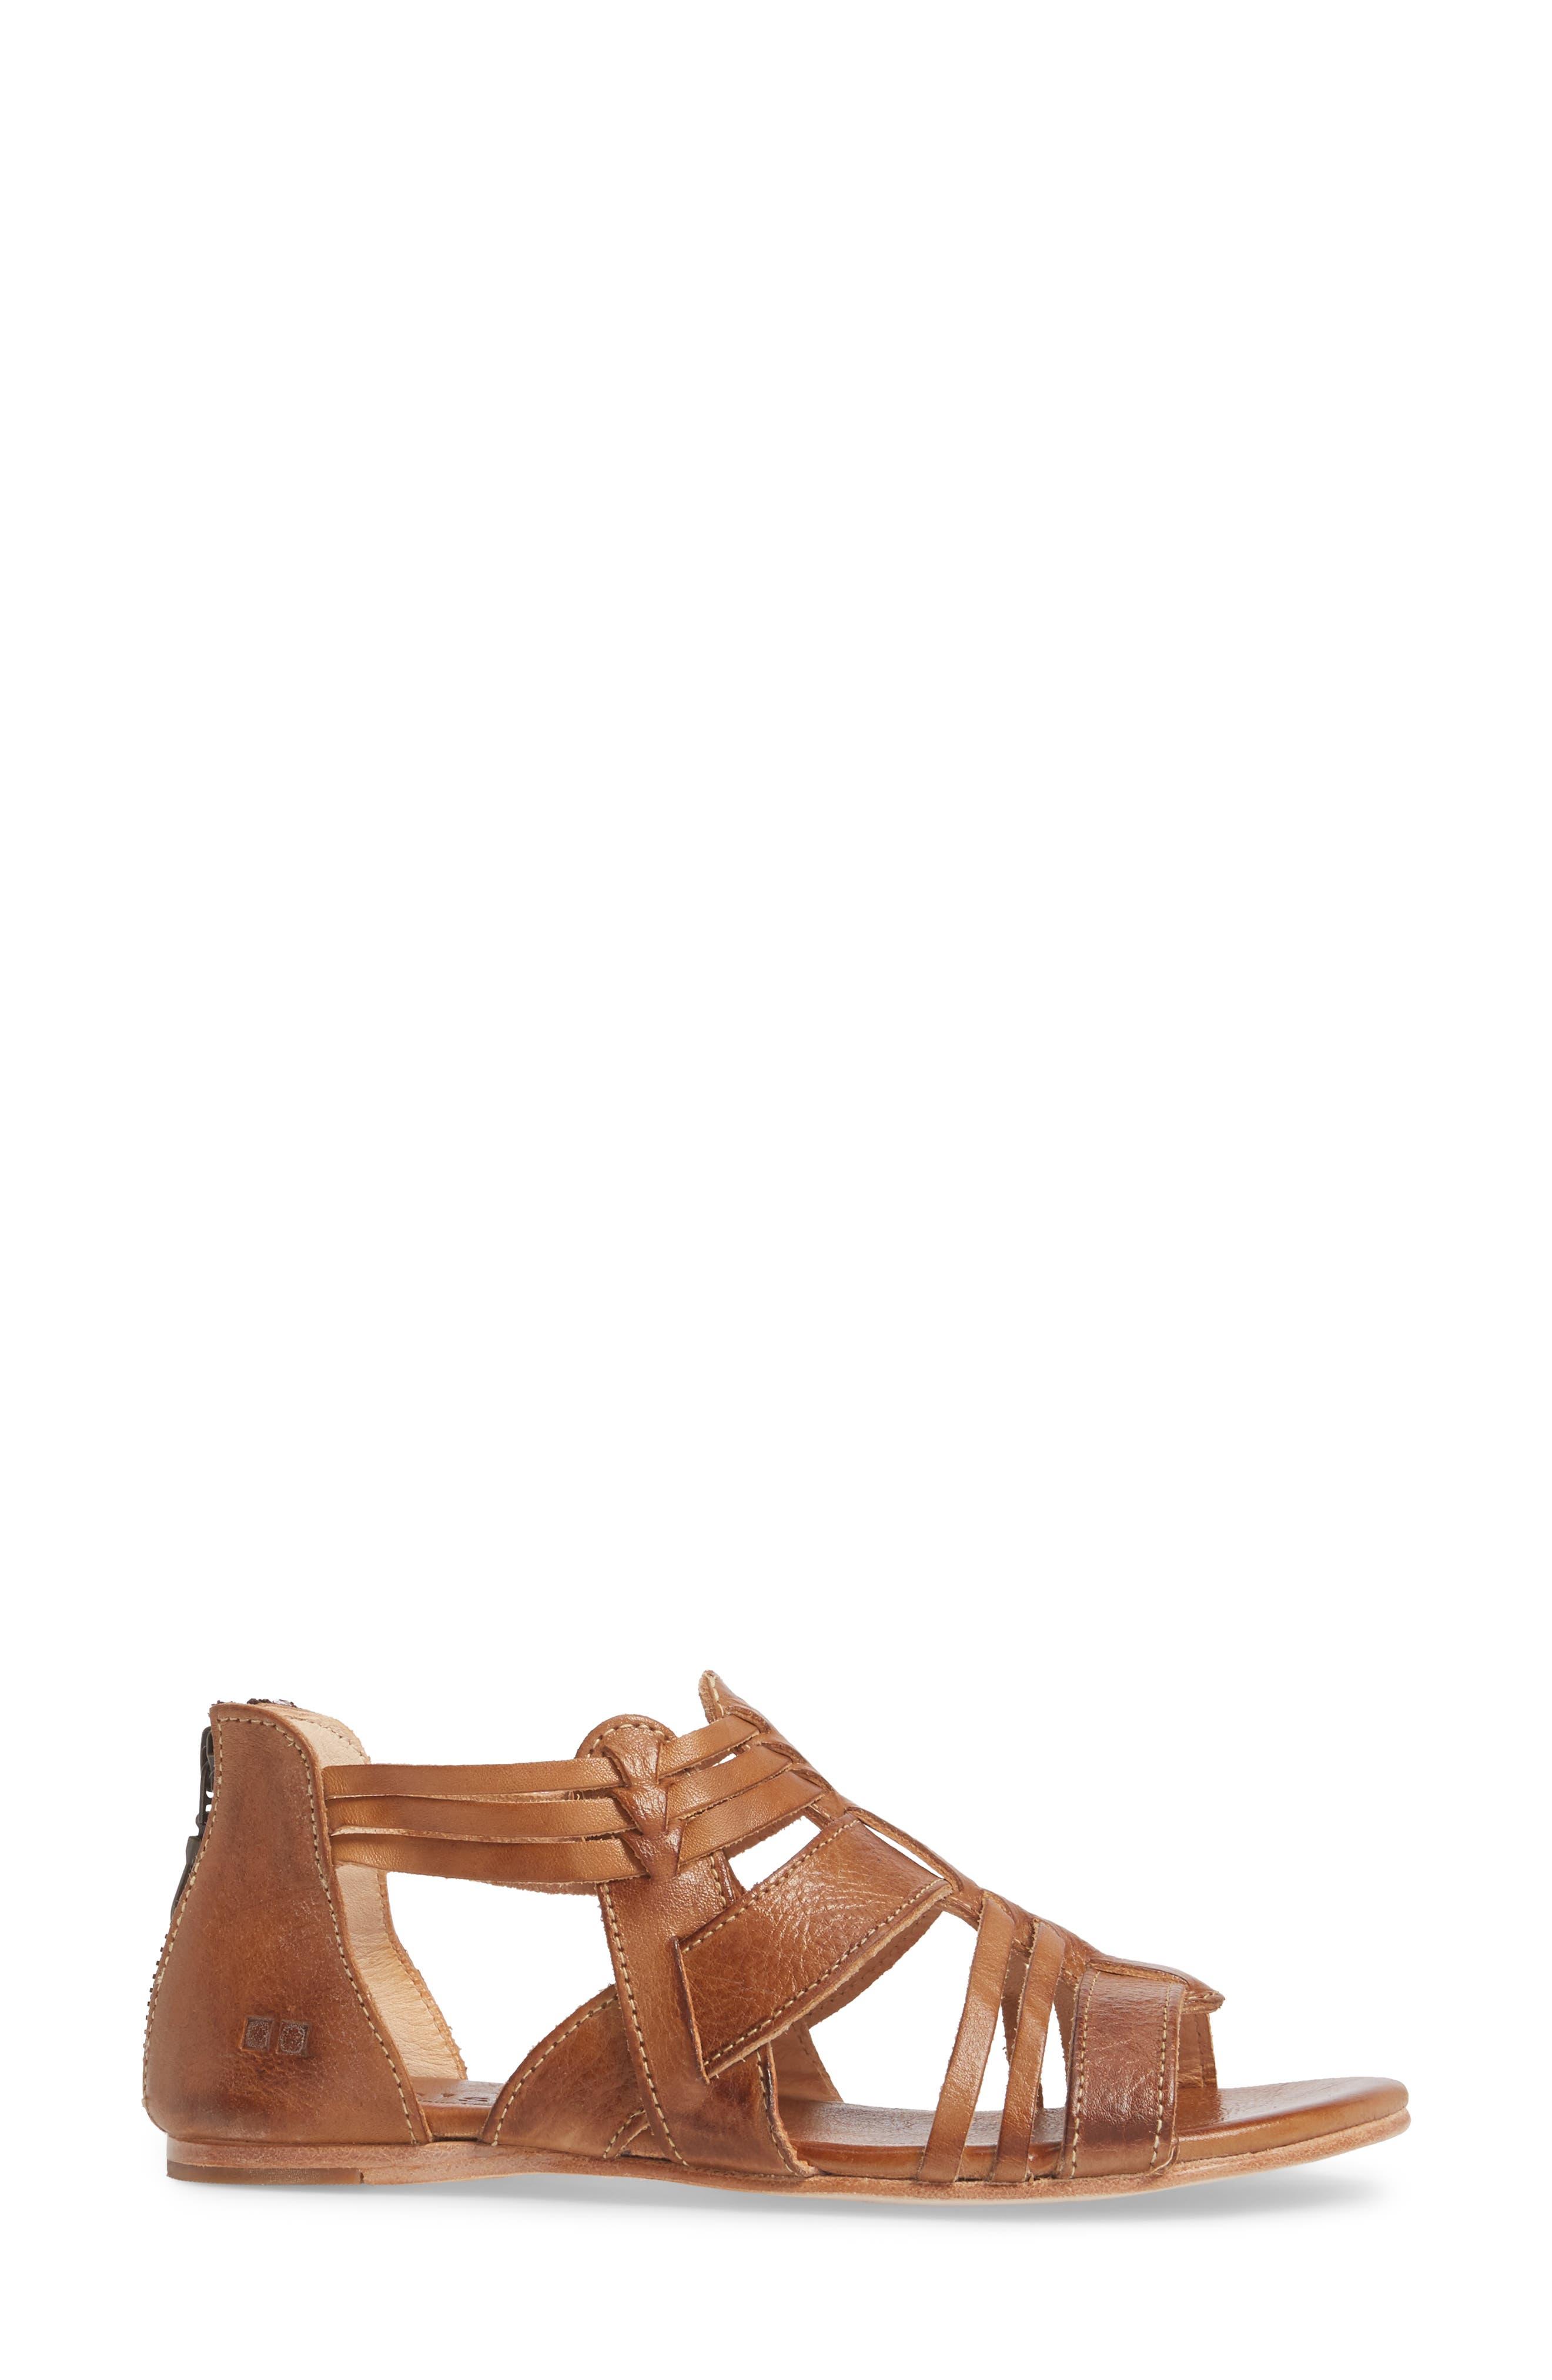 Cara Sandal,                             Alternate thumbnail 3, color,                             Tan Leather